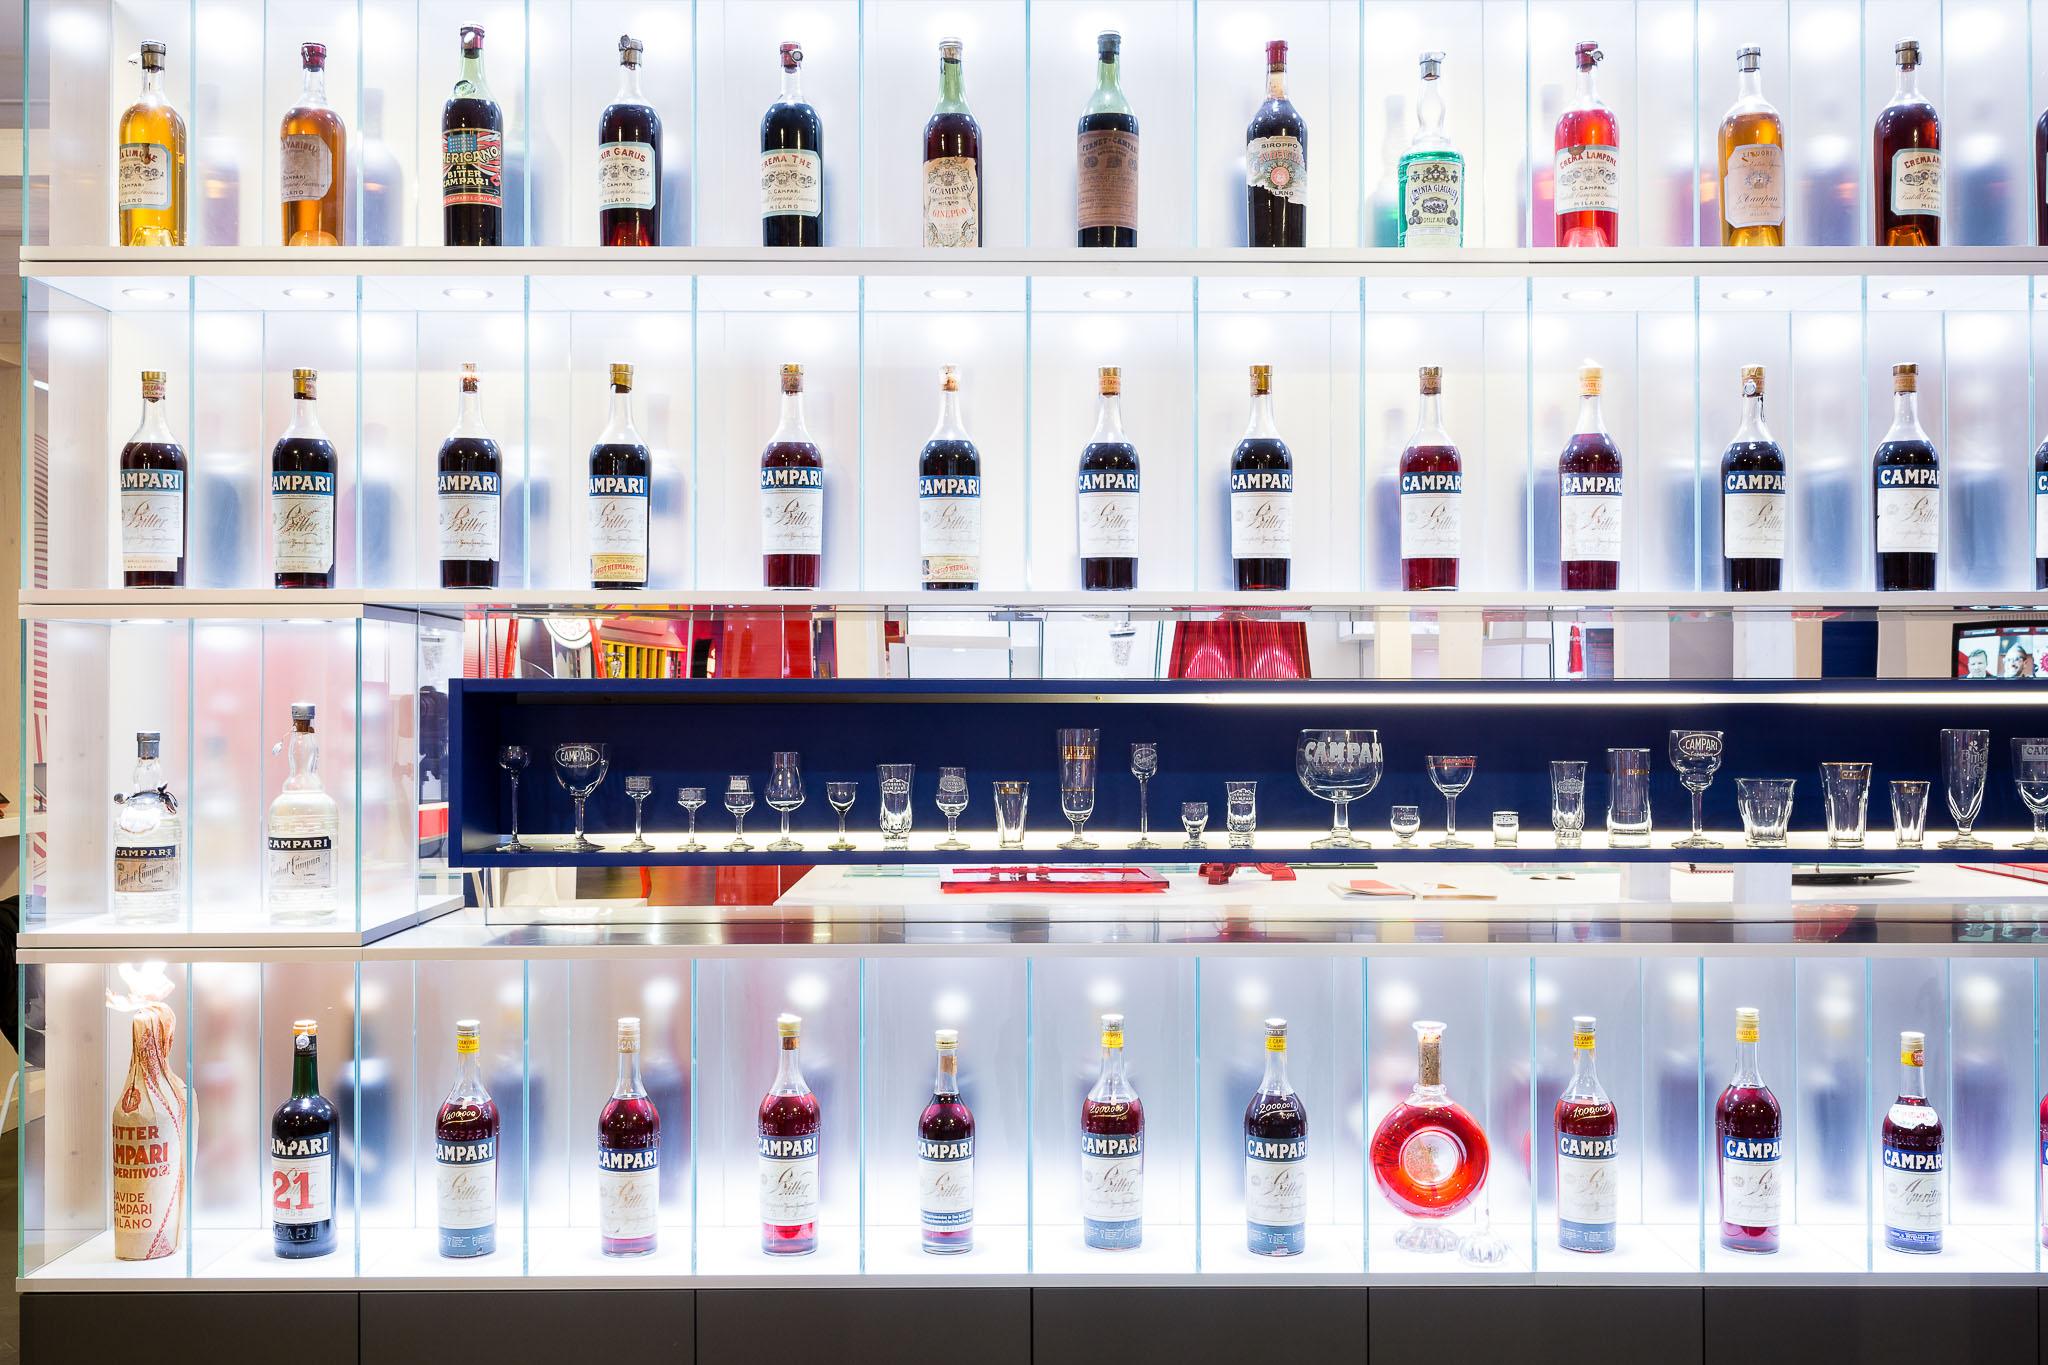 Galleria Campari Bottiglie 2 LoveITALIA